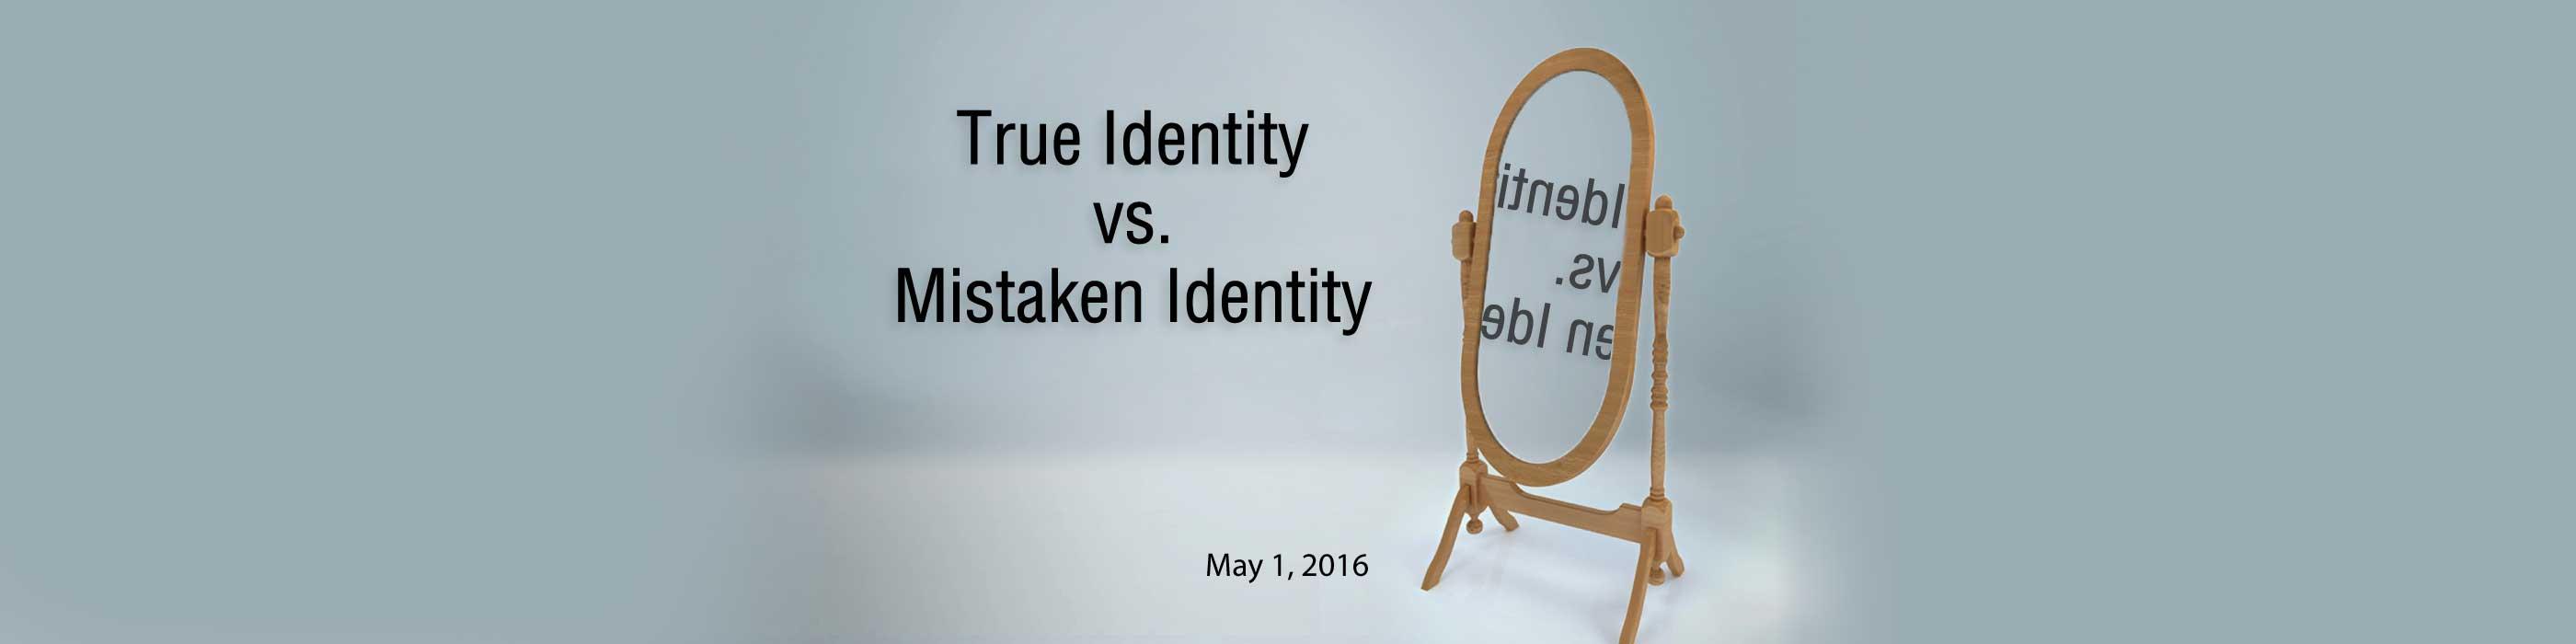 Summit-True-Identity-vs.-Mistaken-Identity-050116-Final_web_2800x700